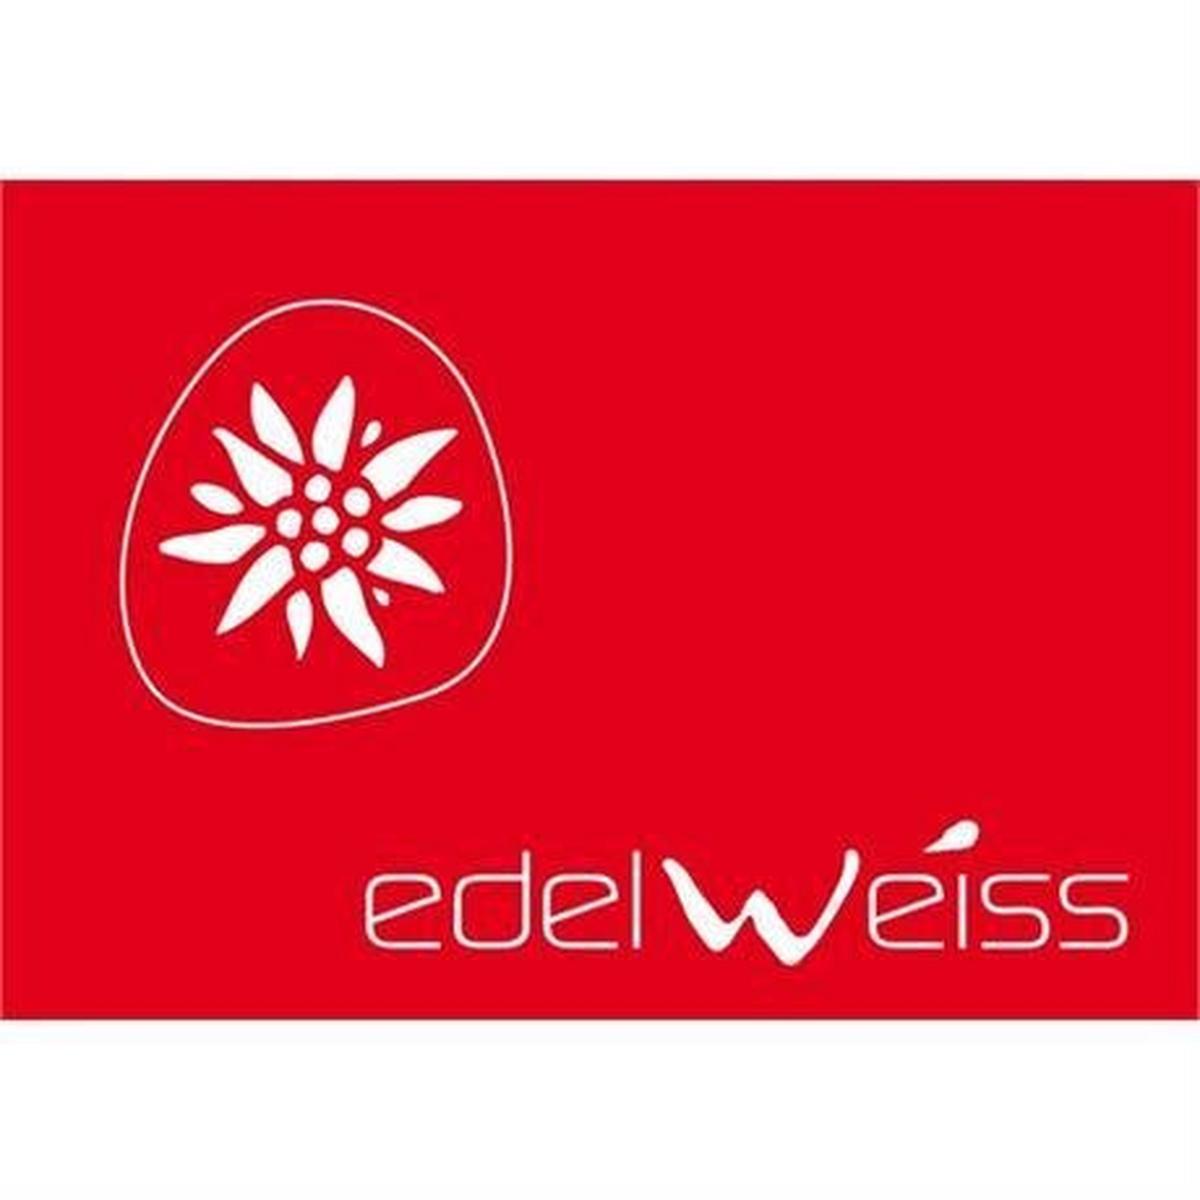 Edelweis Edelwiess Ropes Climbing Rope Flashlight II 10mm x 50m